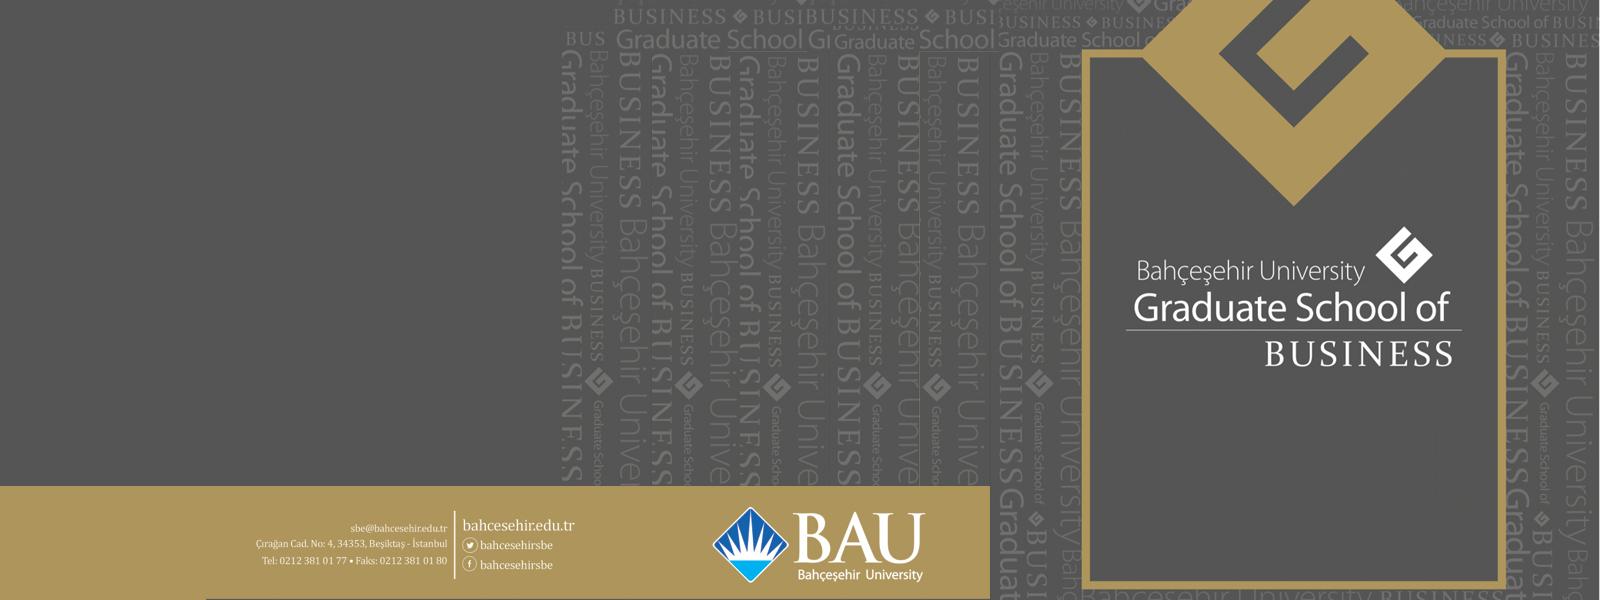 http://content.bahcesehir.edu.tr/BAU Graduate School Of Business, Bahçeşehir Üniversitesi, BAU